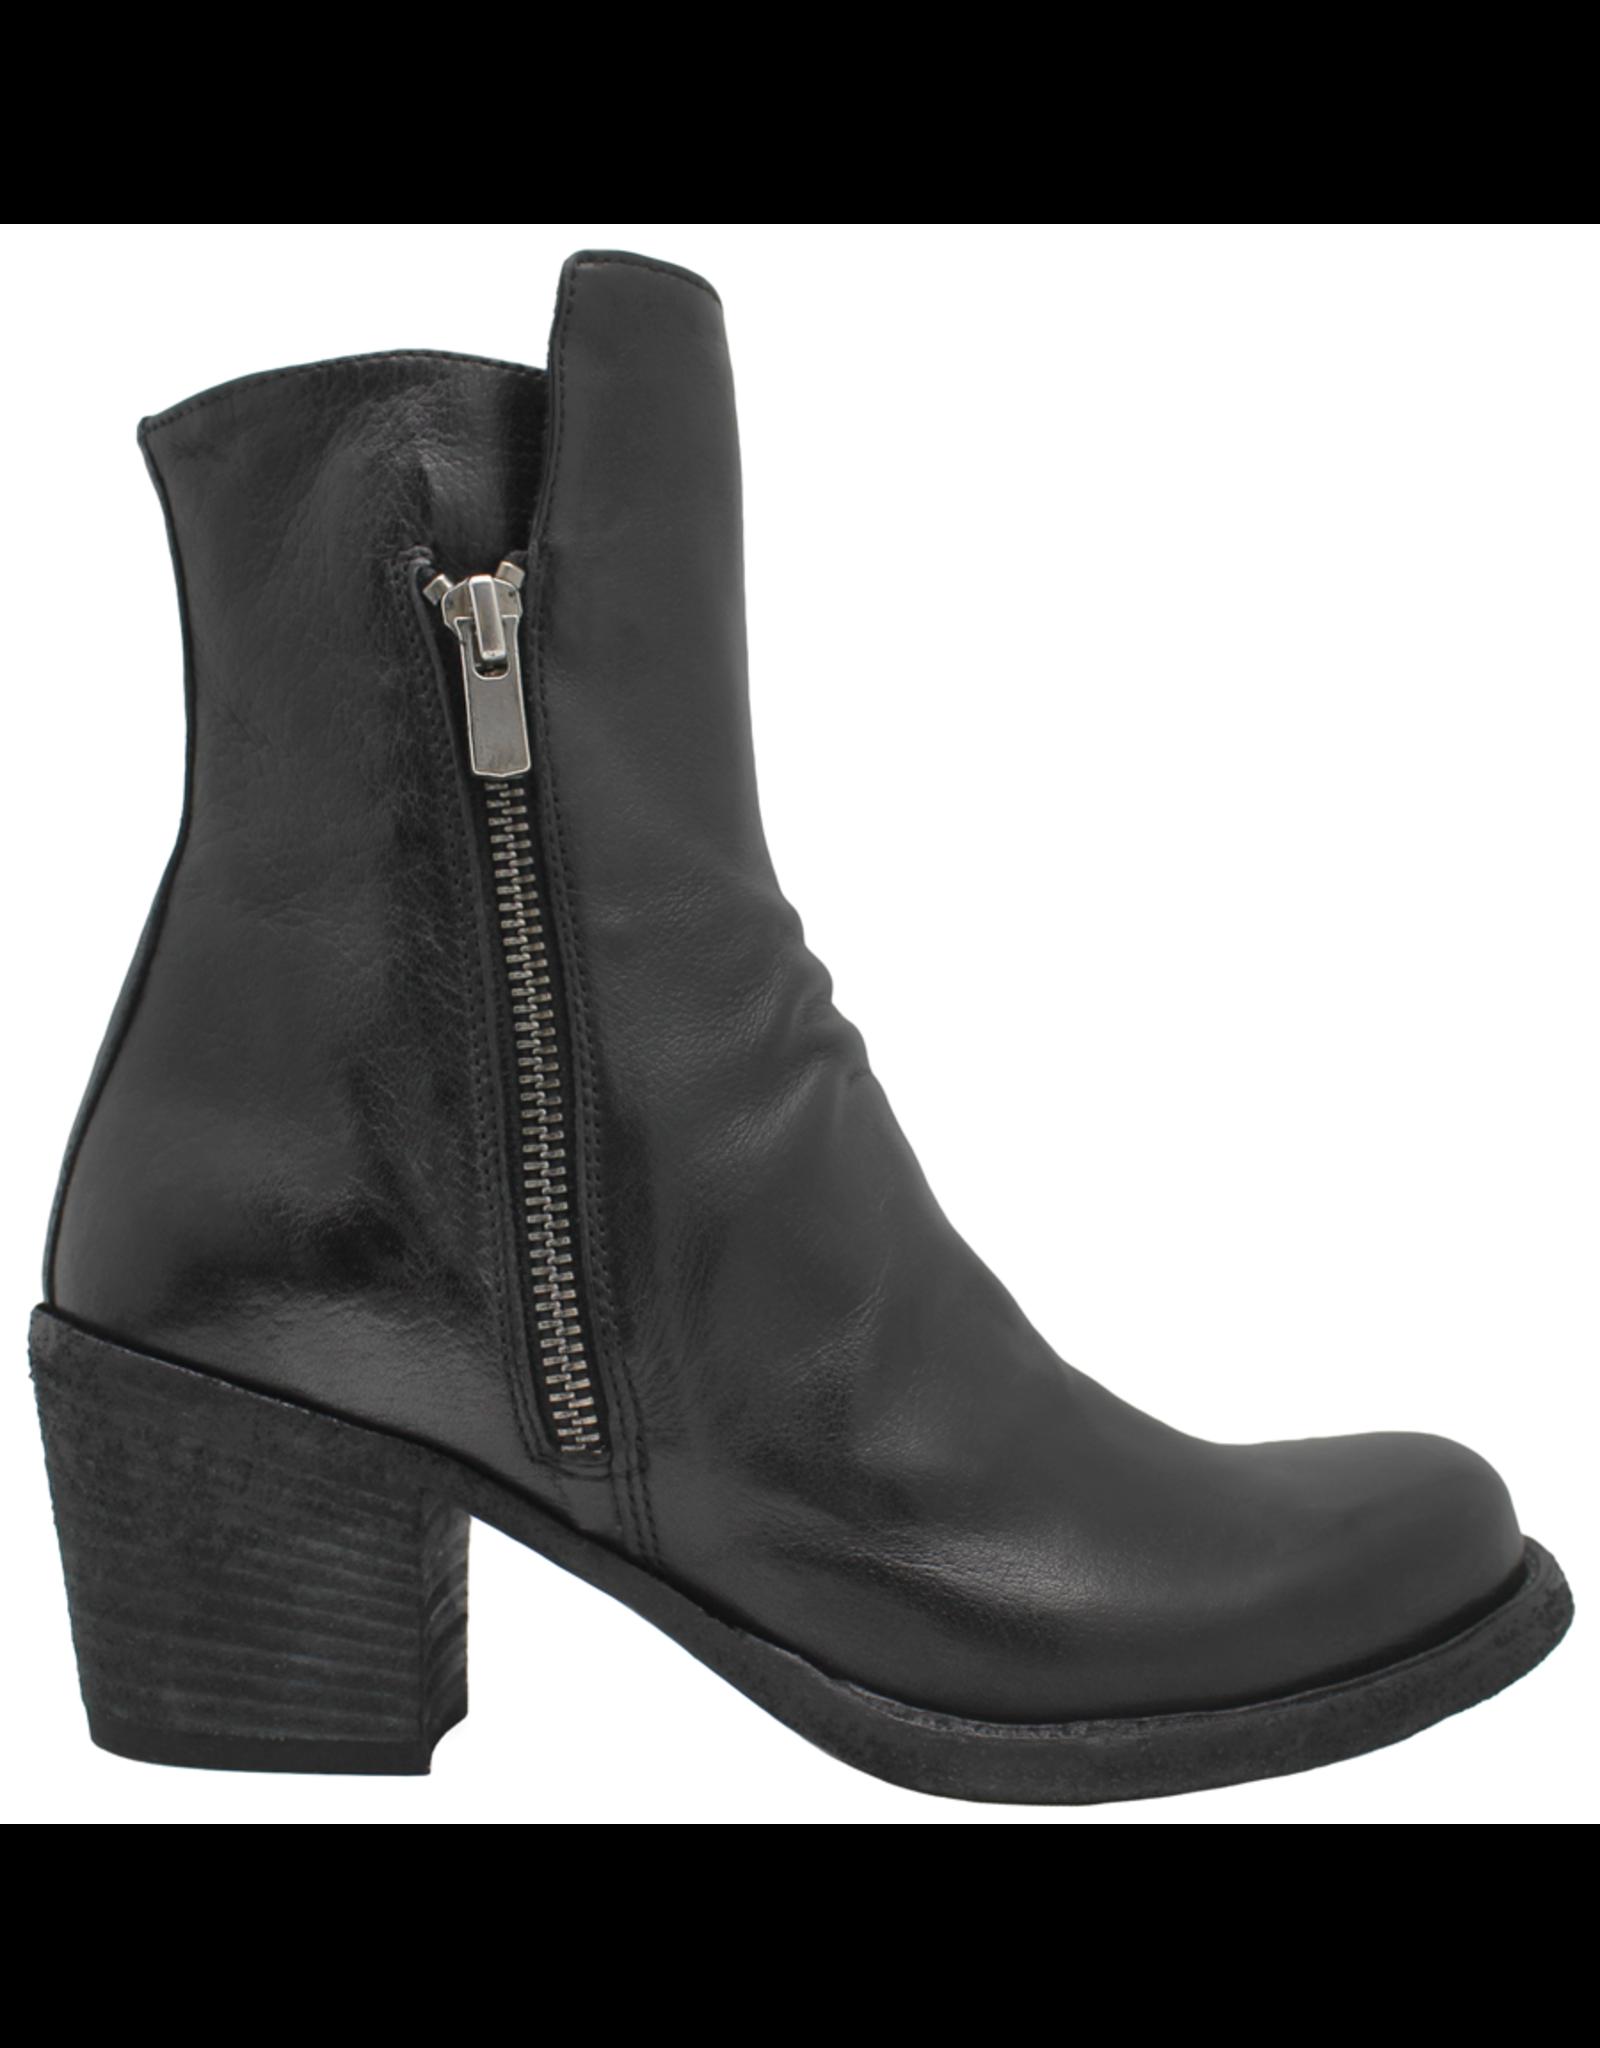 Officine Creative OfficineCreative Black Double Zipper Calf Ankle Boot Ariel